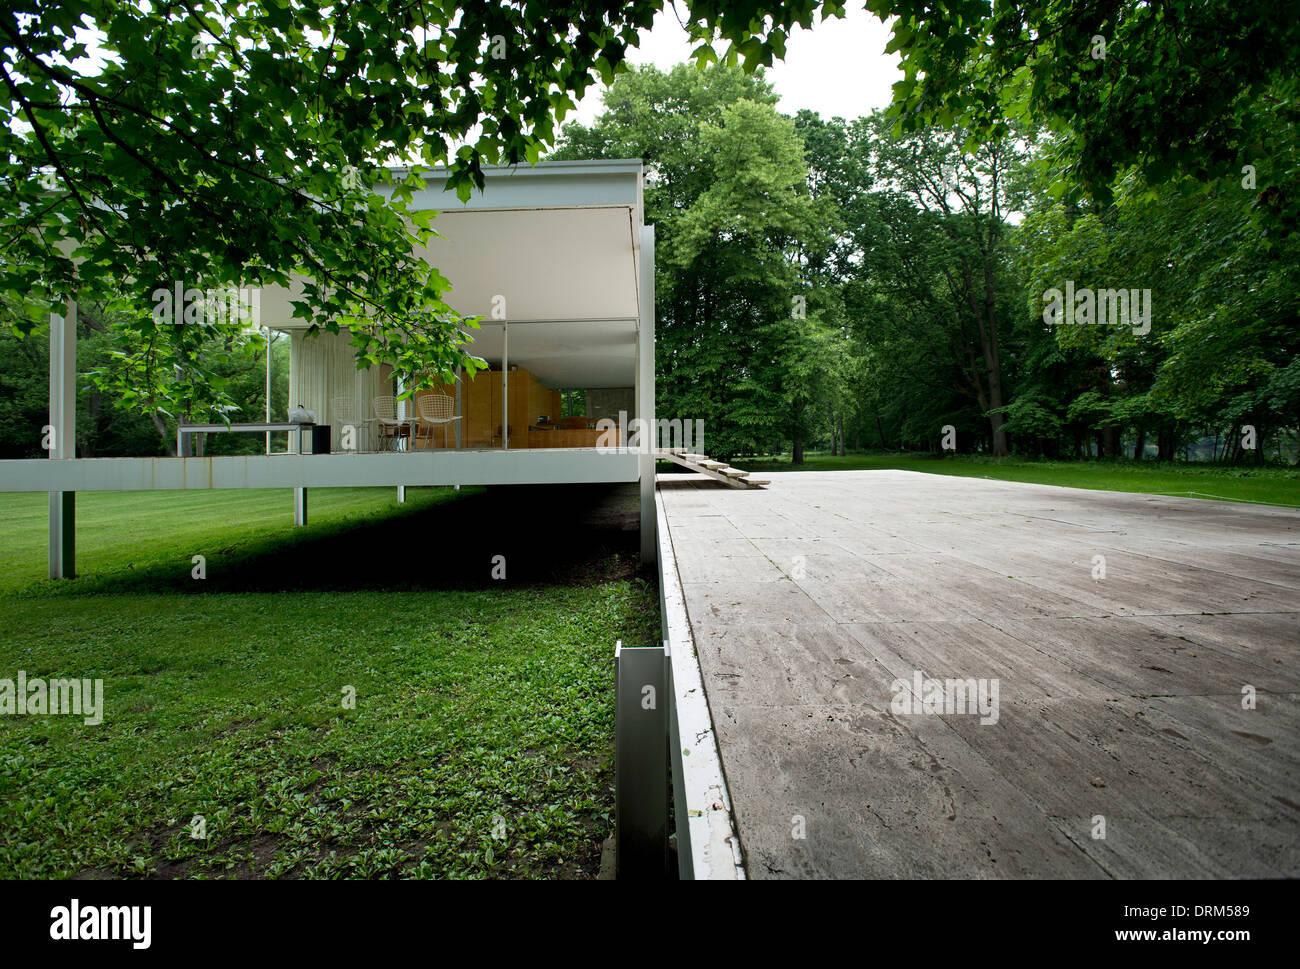 Farnsworth house by mies van der rohe exterior 8 jpg - Farnsworth House Plano United States Architect Ludwig Mies Van Der Rohe